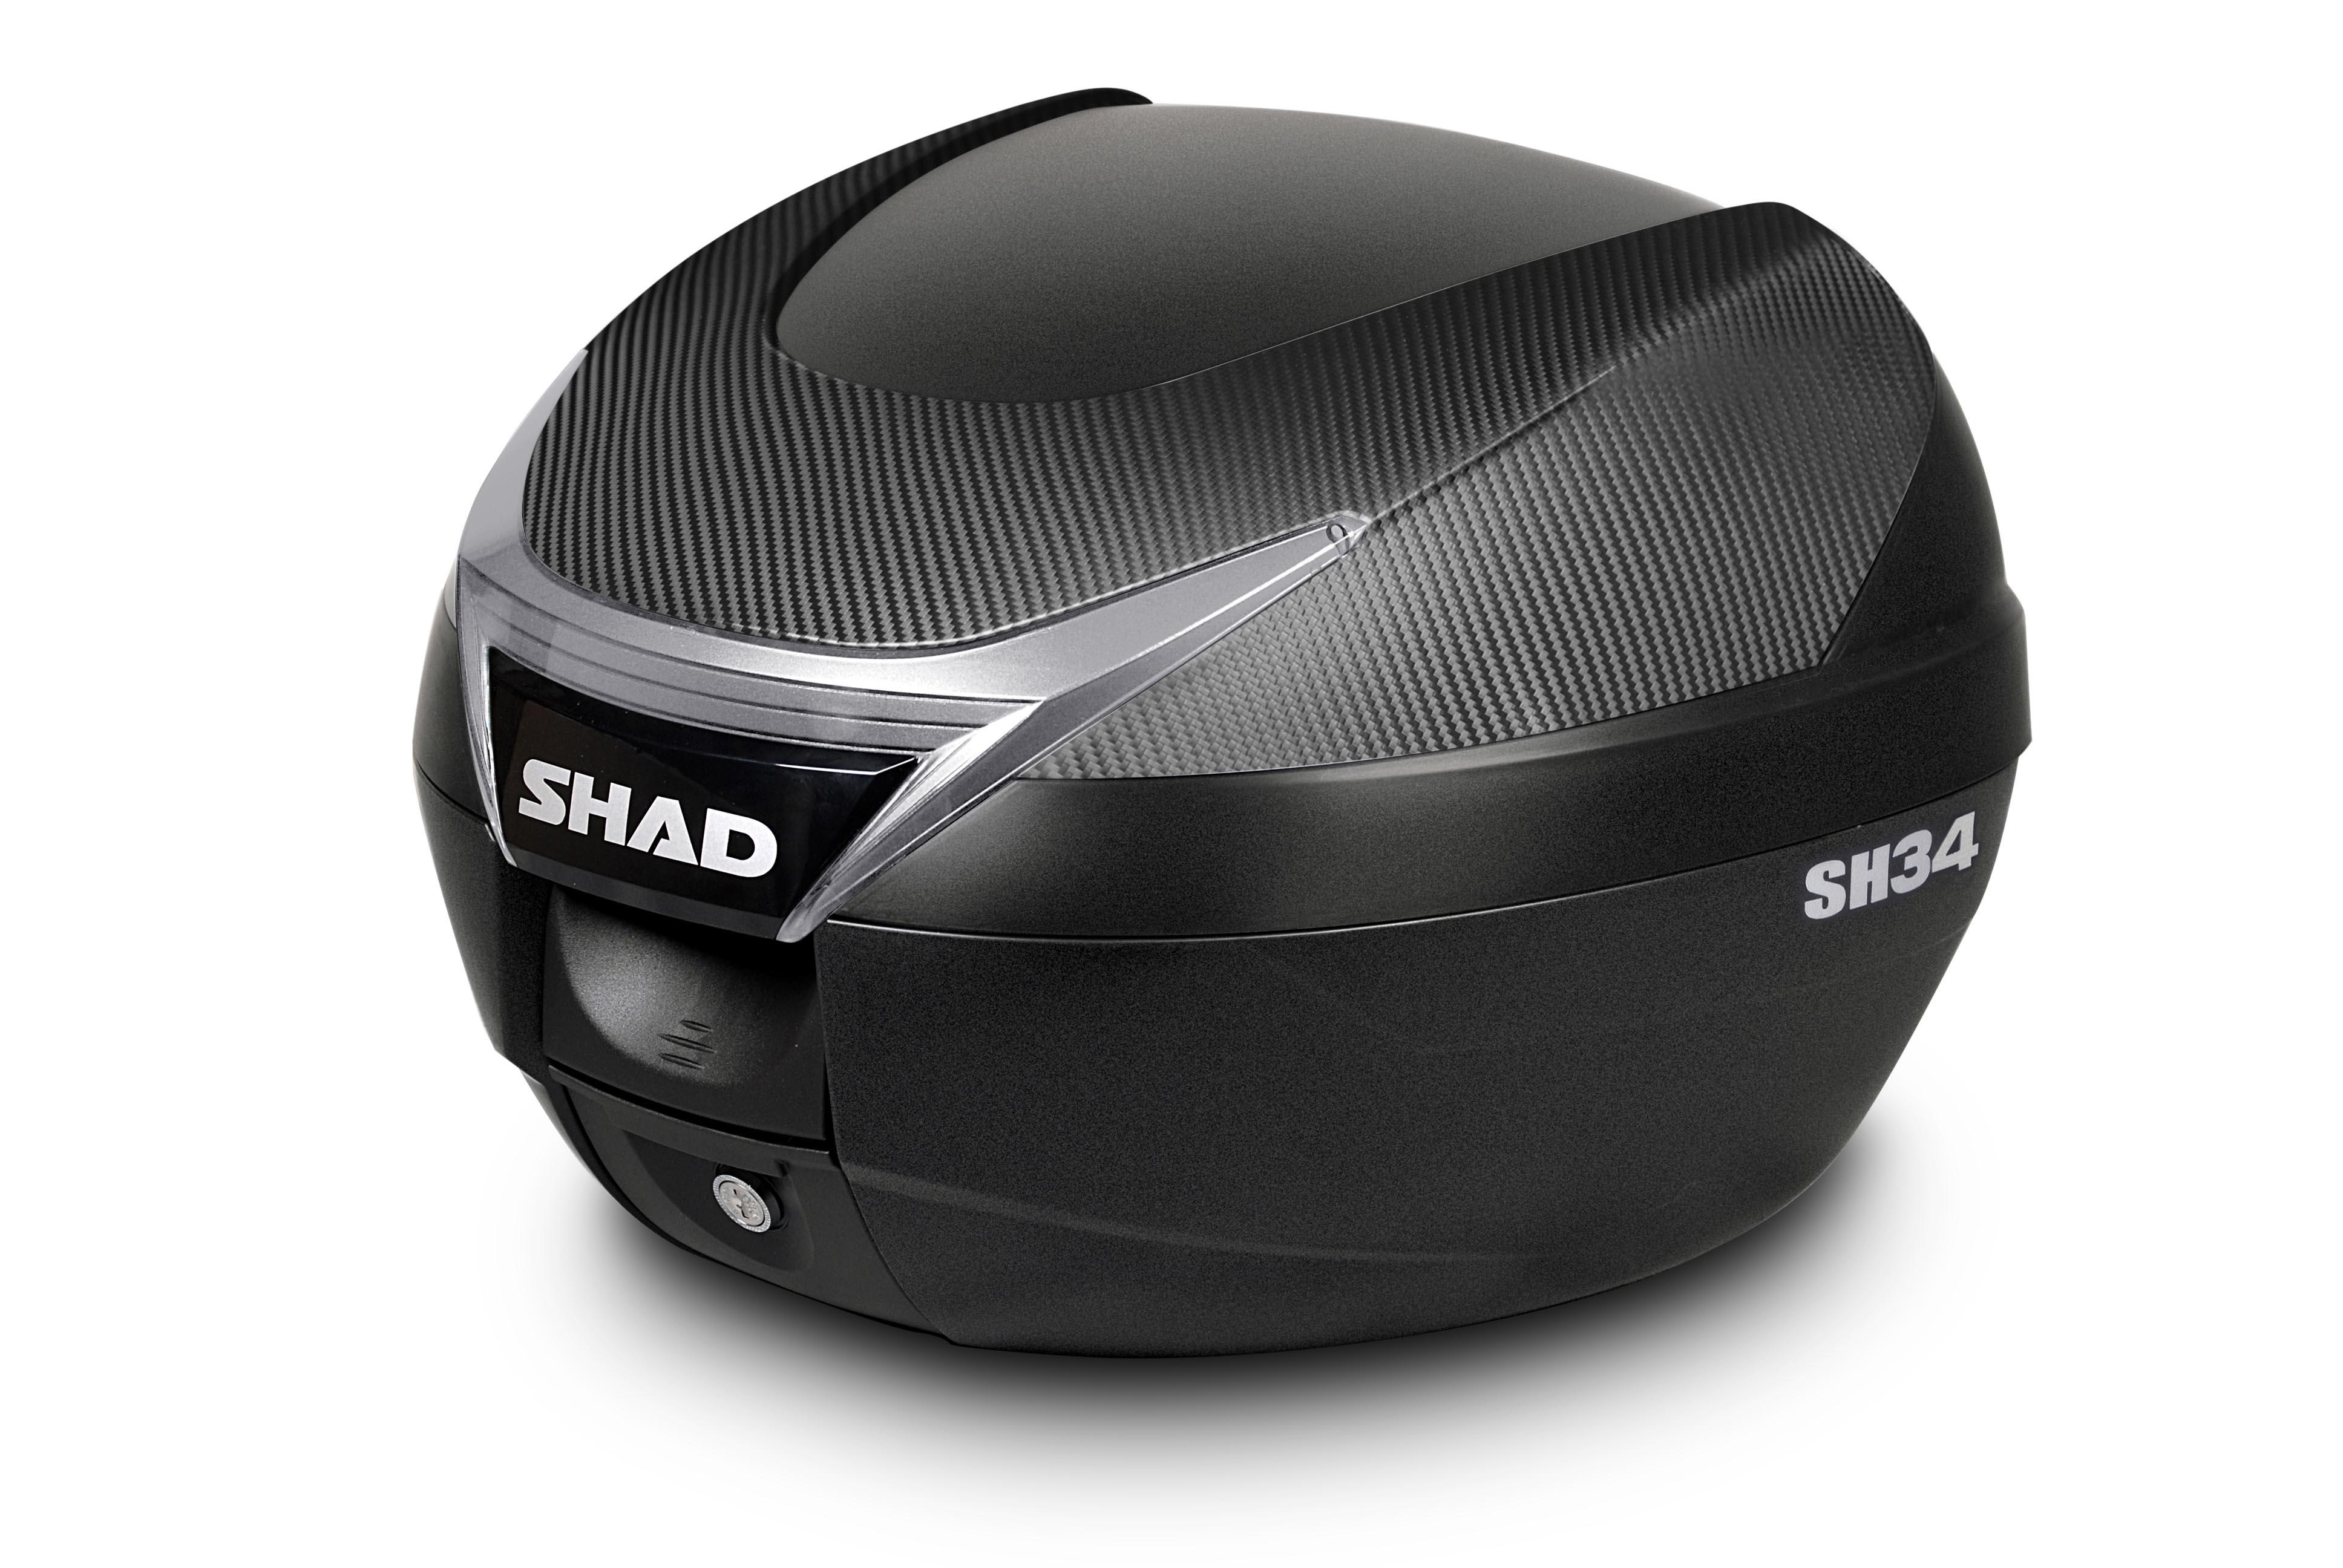 shad  sh43 Carbono